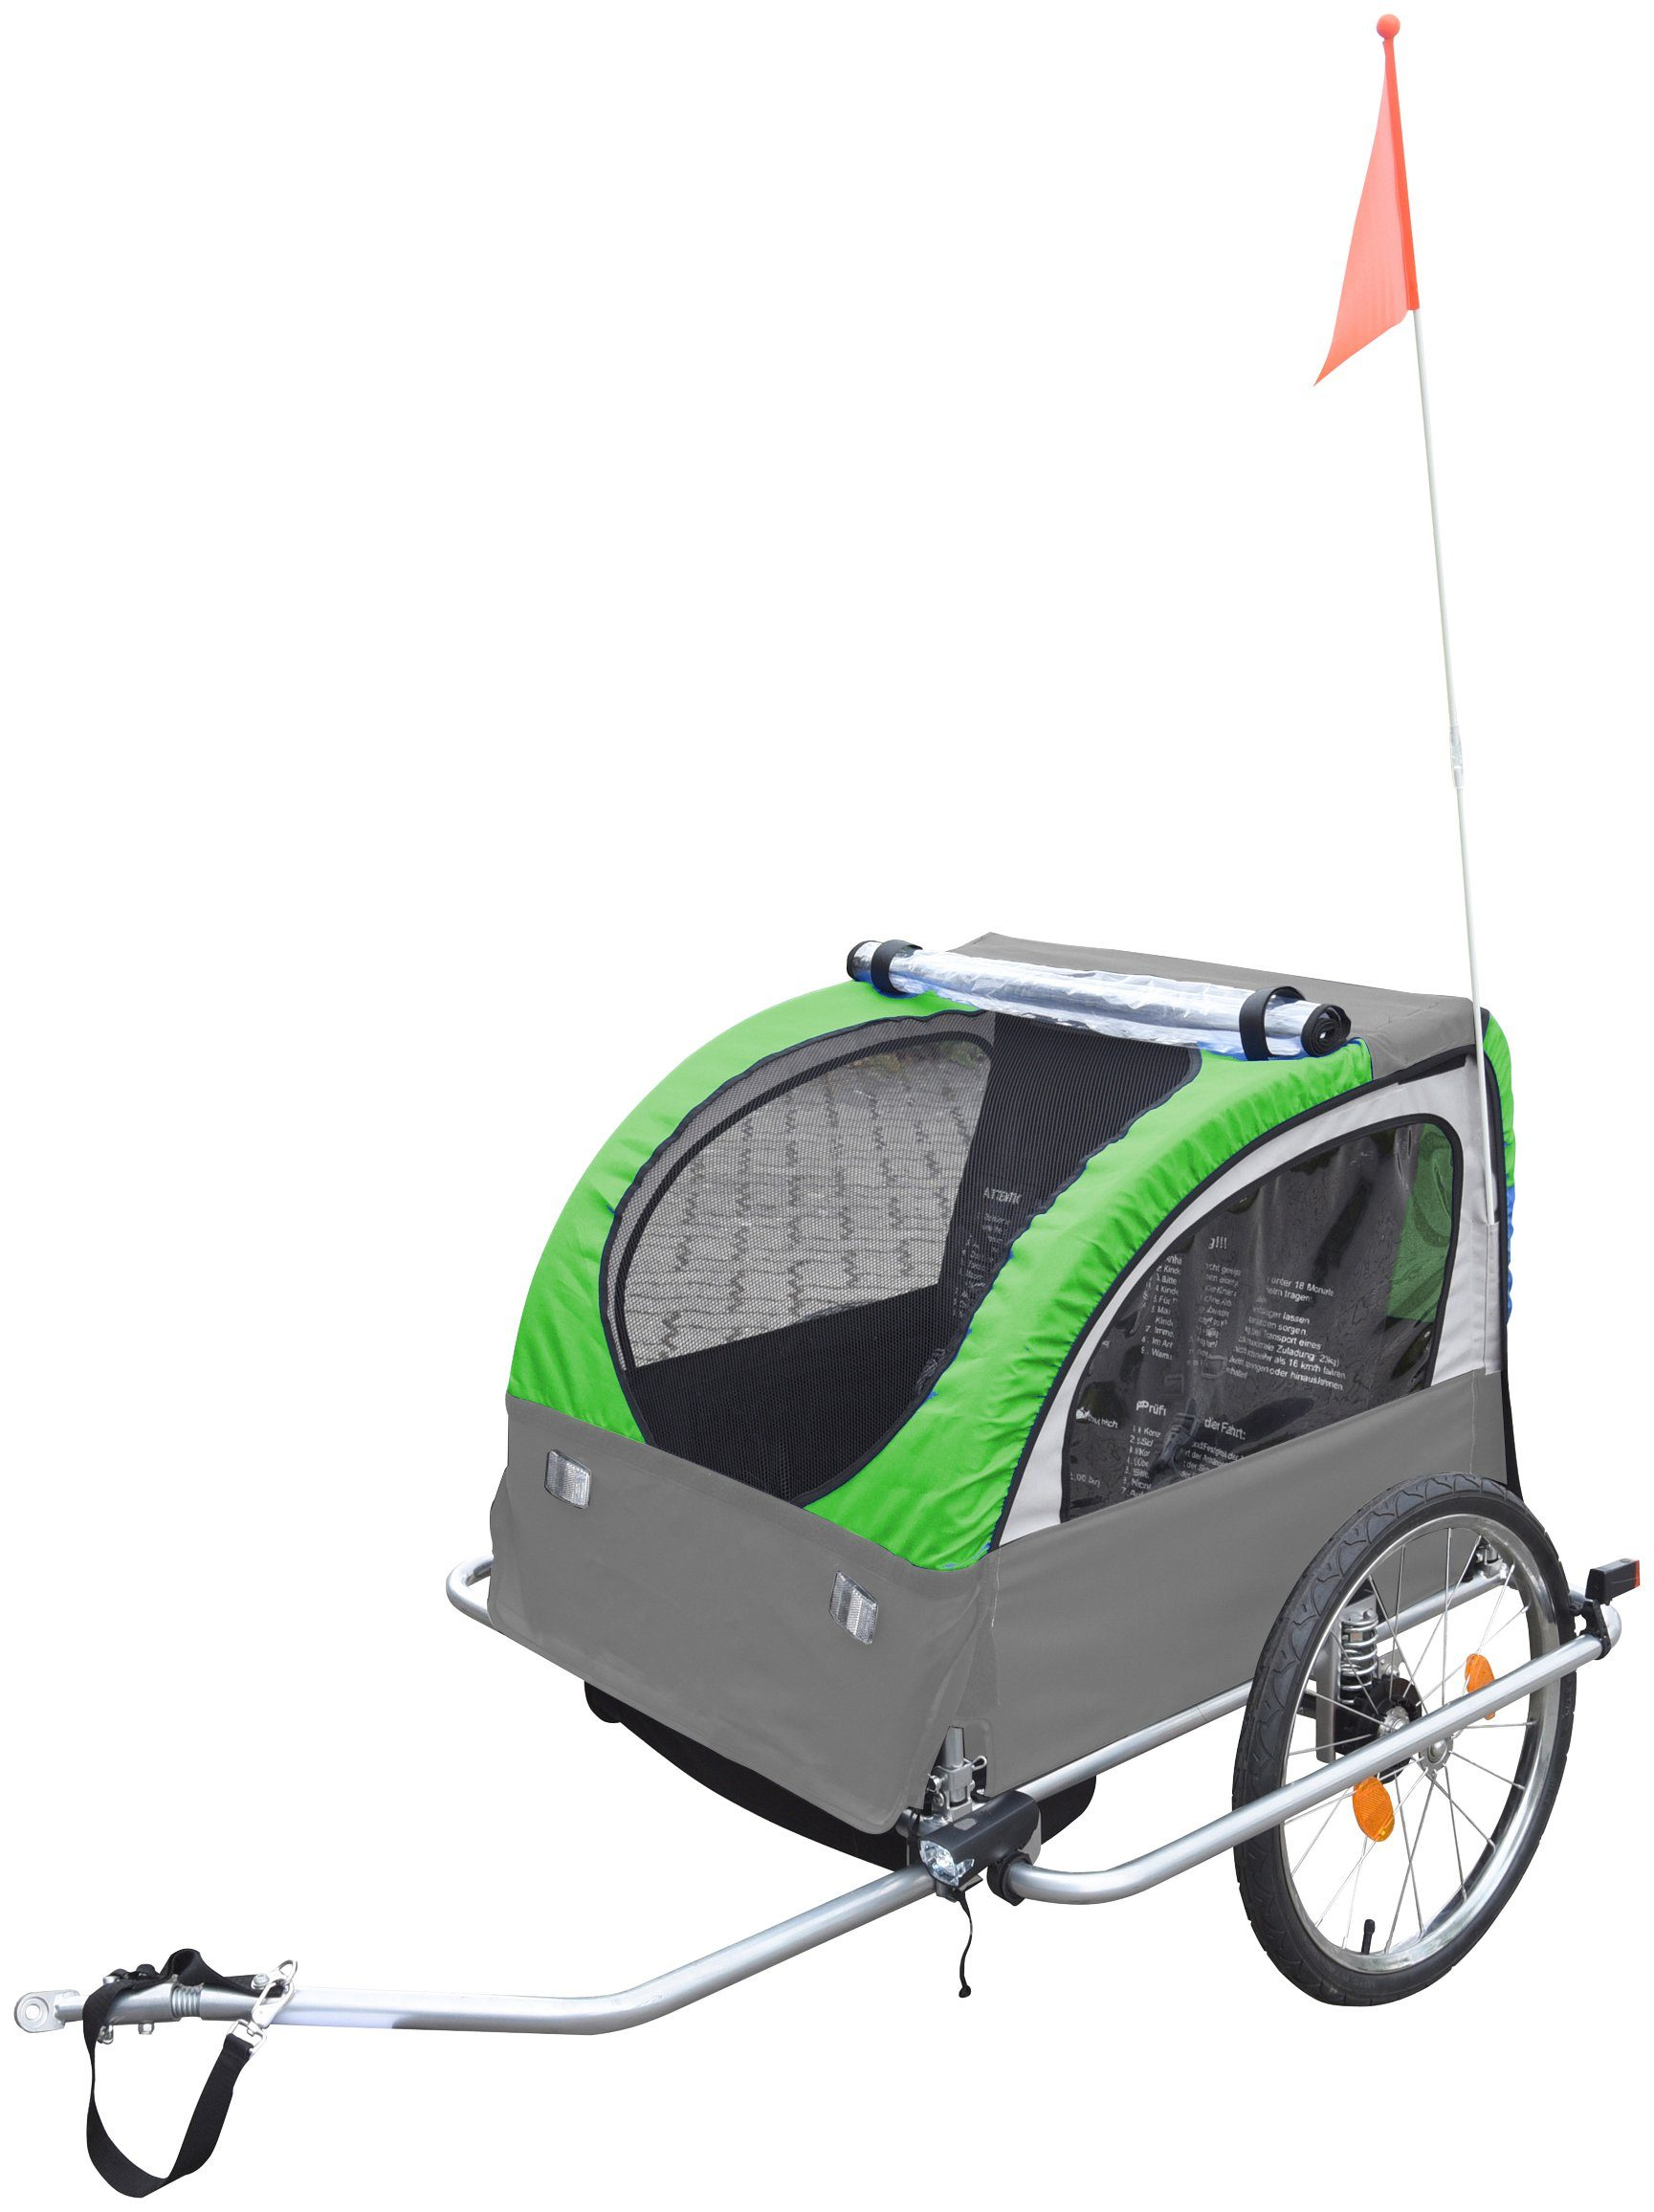 Kinder-Fahrradanhänger »Komfort«, 2 Sitzplätze, gefedert